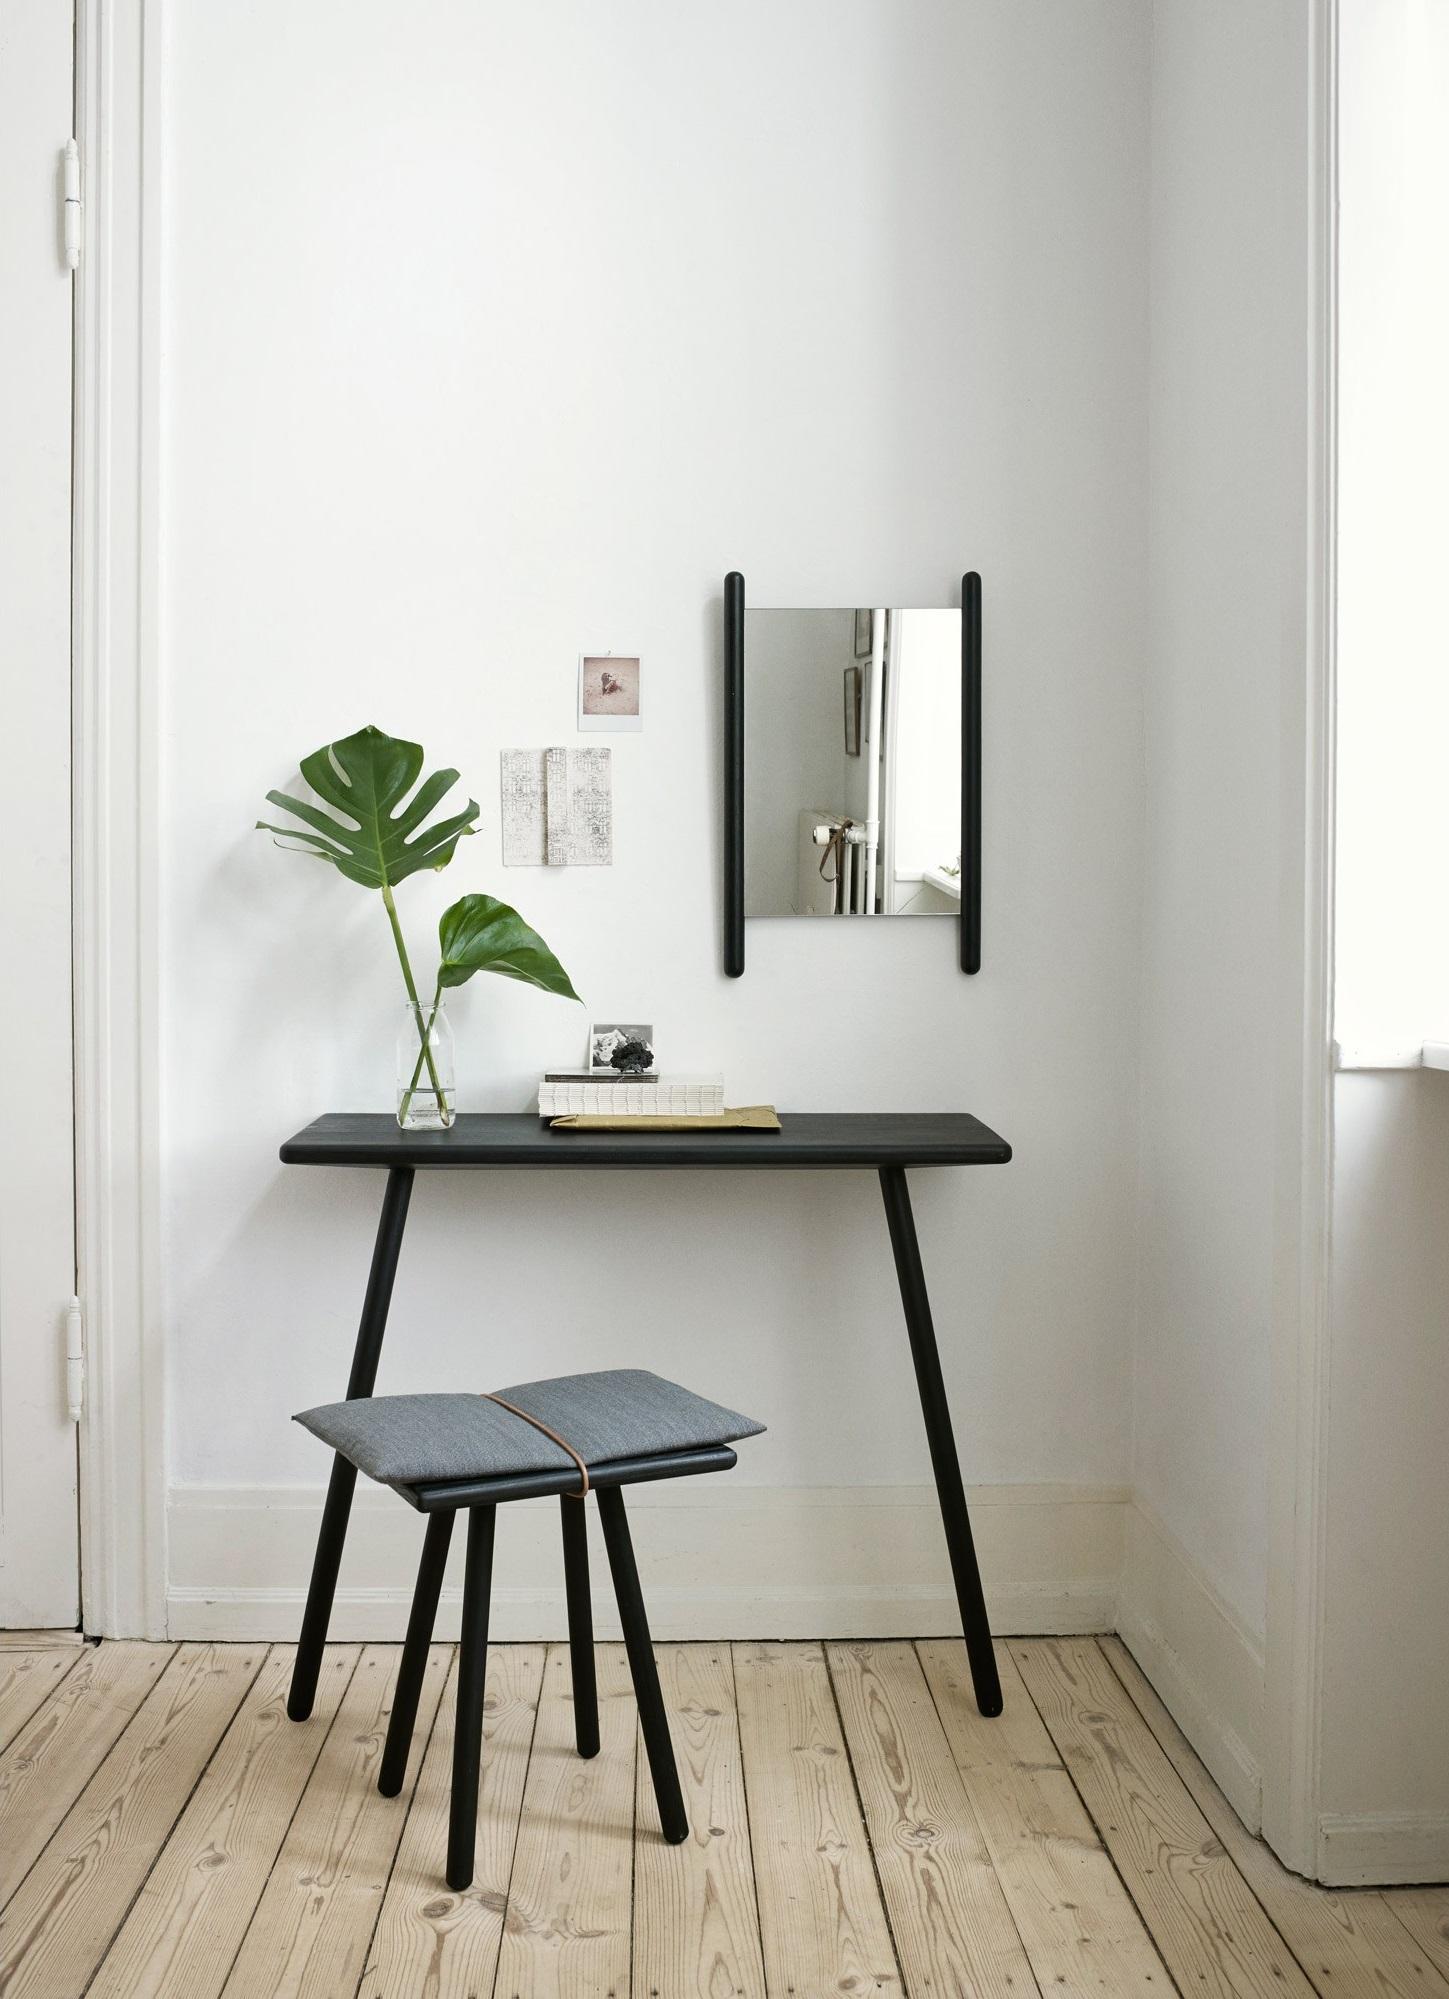 georg-console-table-skagerak-elle-decoration-design-award-2016-by-chiara-stella-home-2